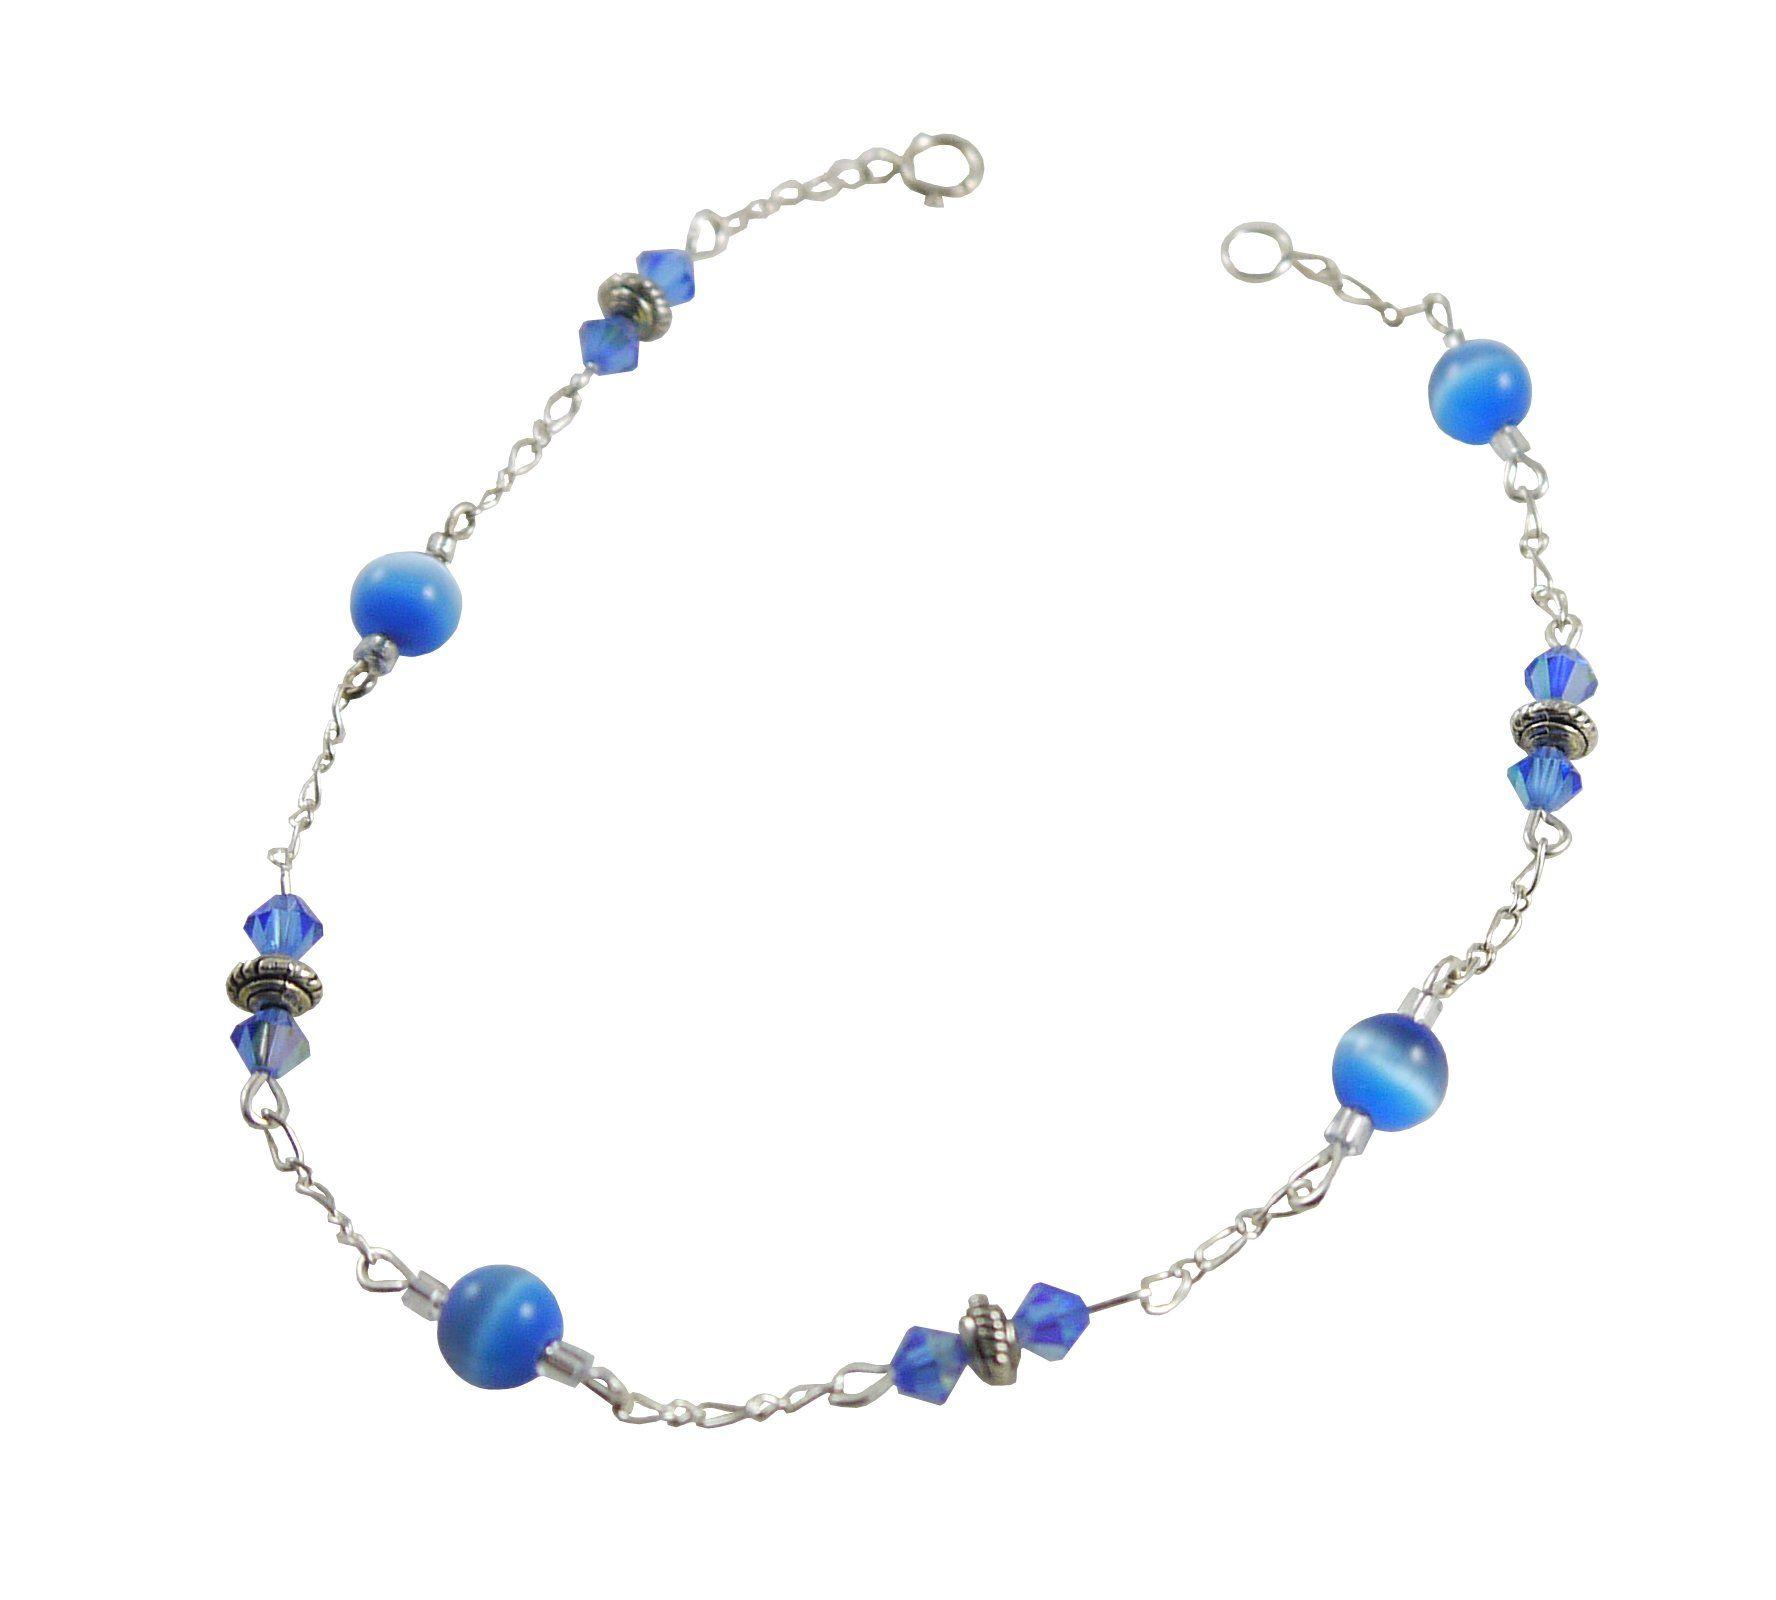 Vivid Sky Blue Cat S Eye Anklet 9 5 Sterling Silver